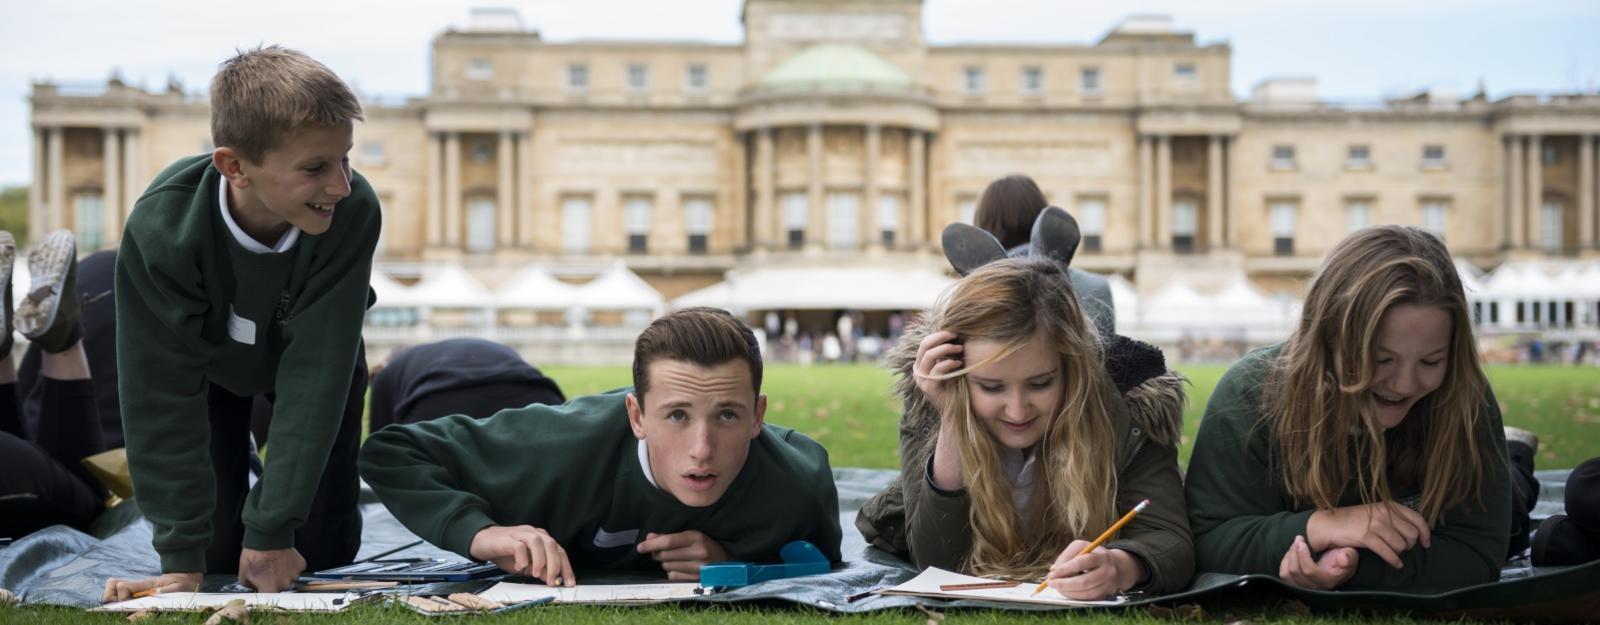 Pupils drawing in Buckingham Palace Garden